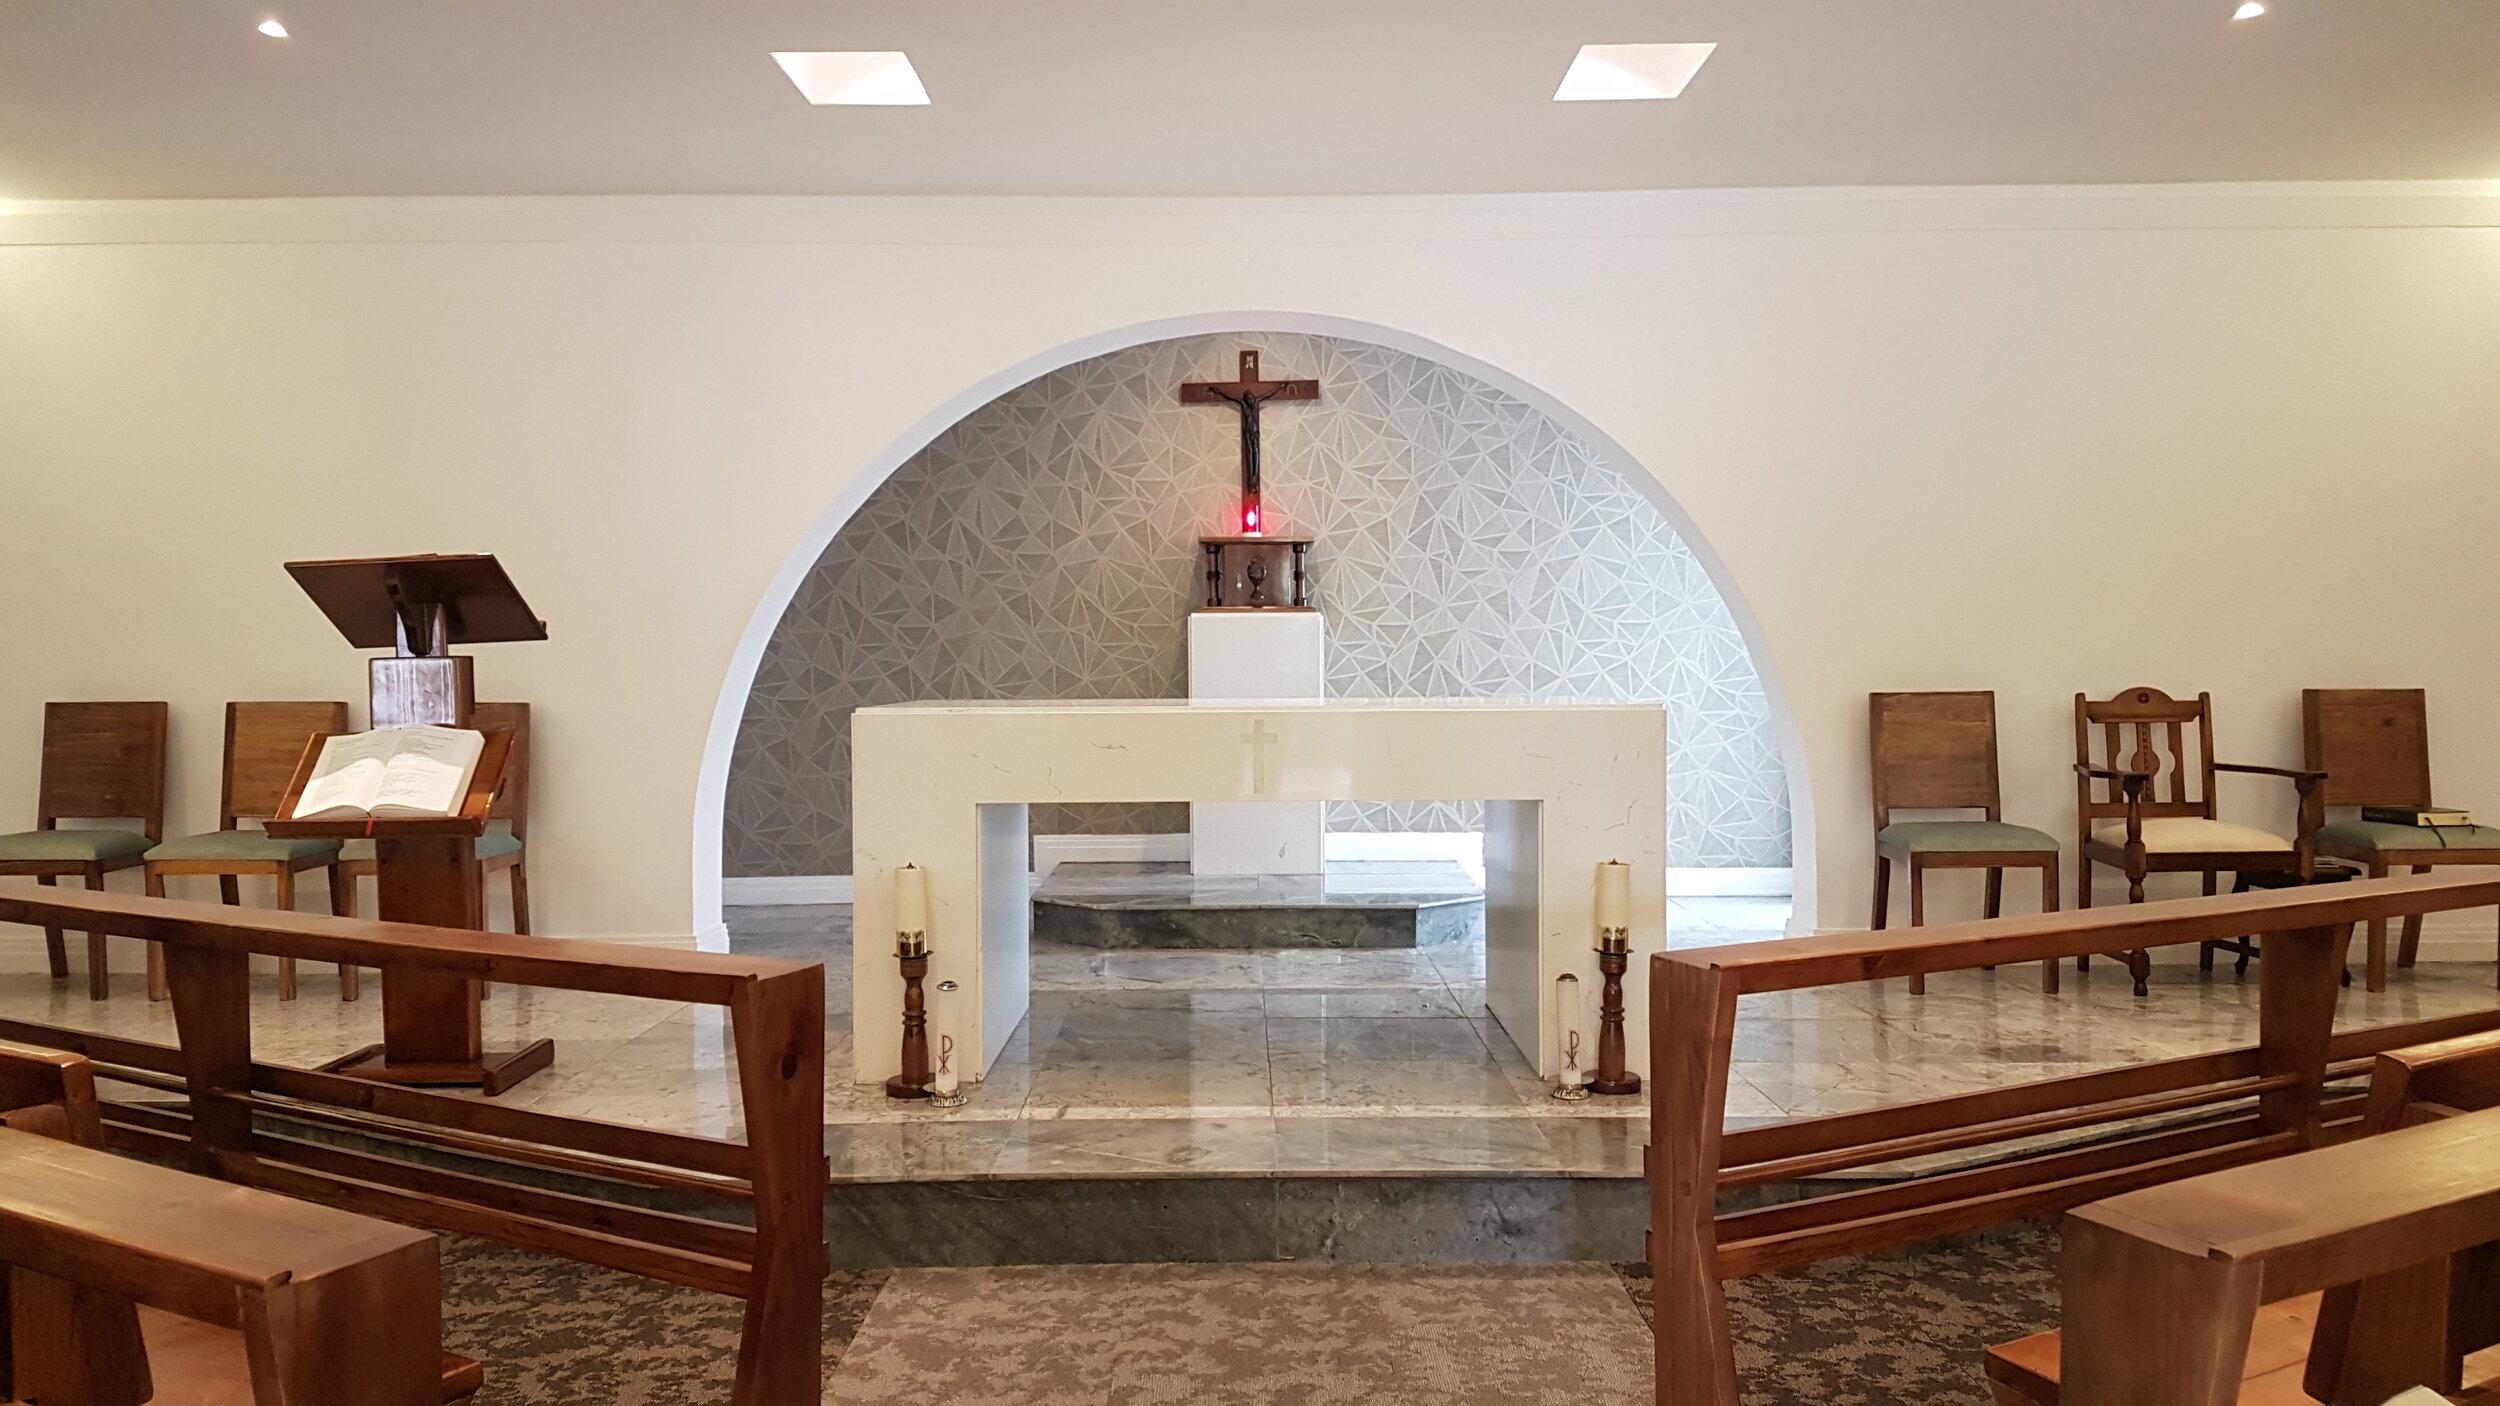 Scottsville chapel - Pietermaritzburg